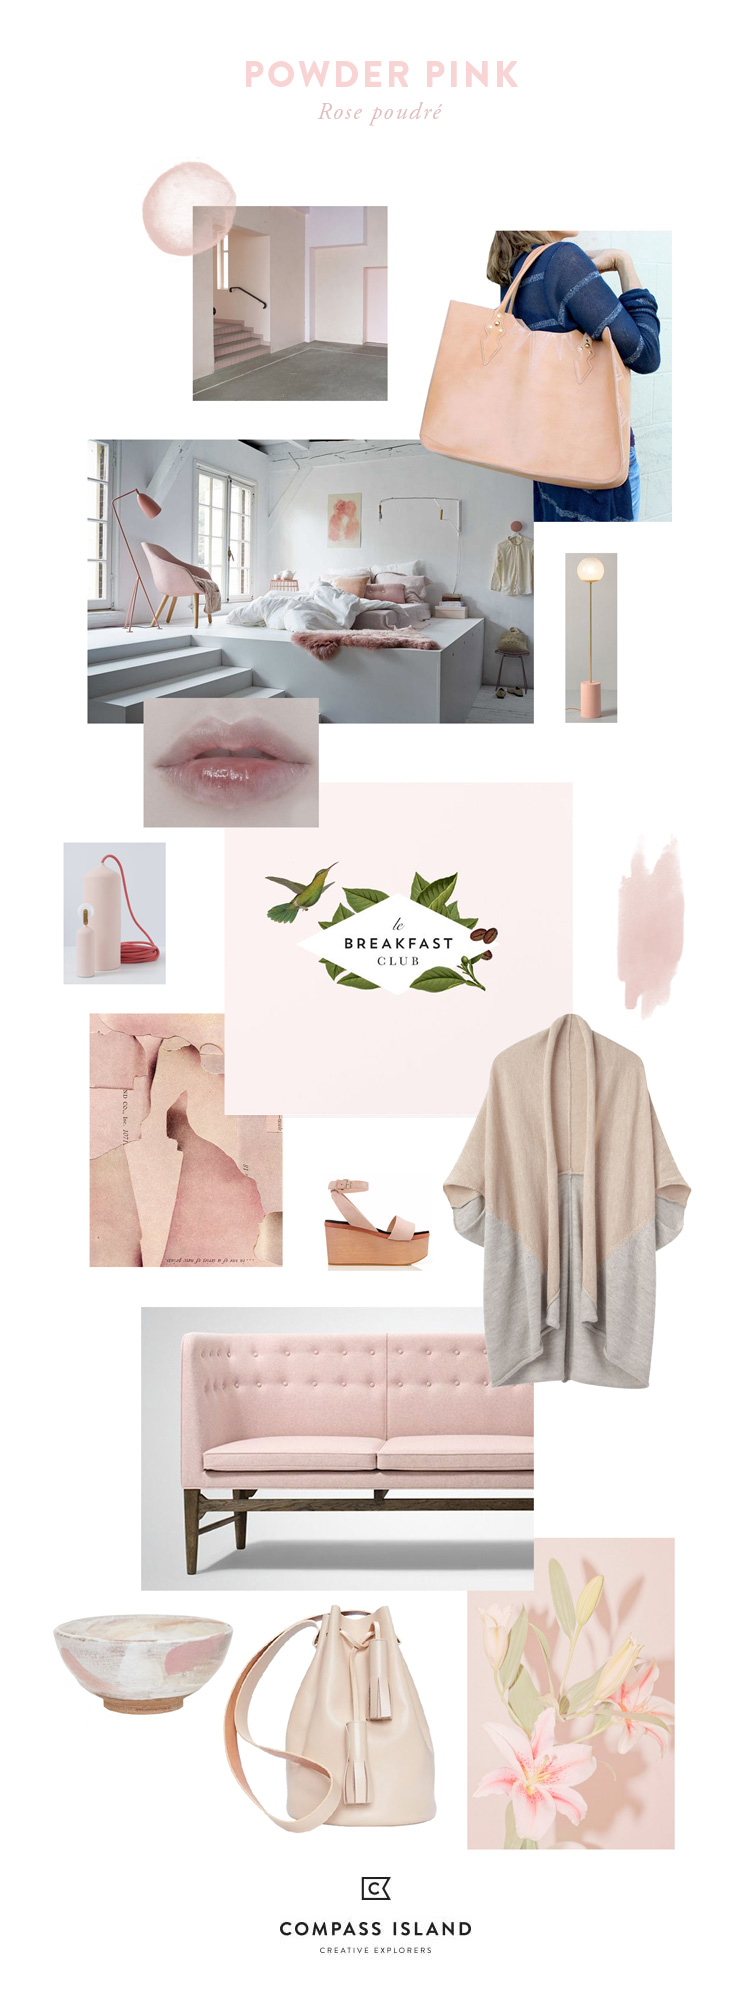 Powder Pink by Compass Island